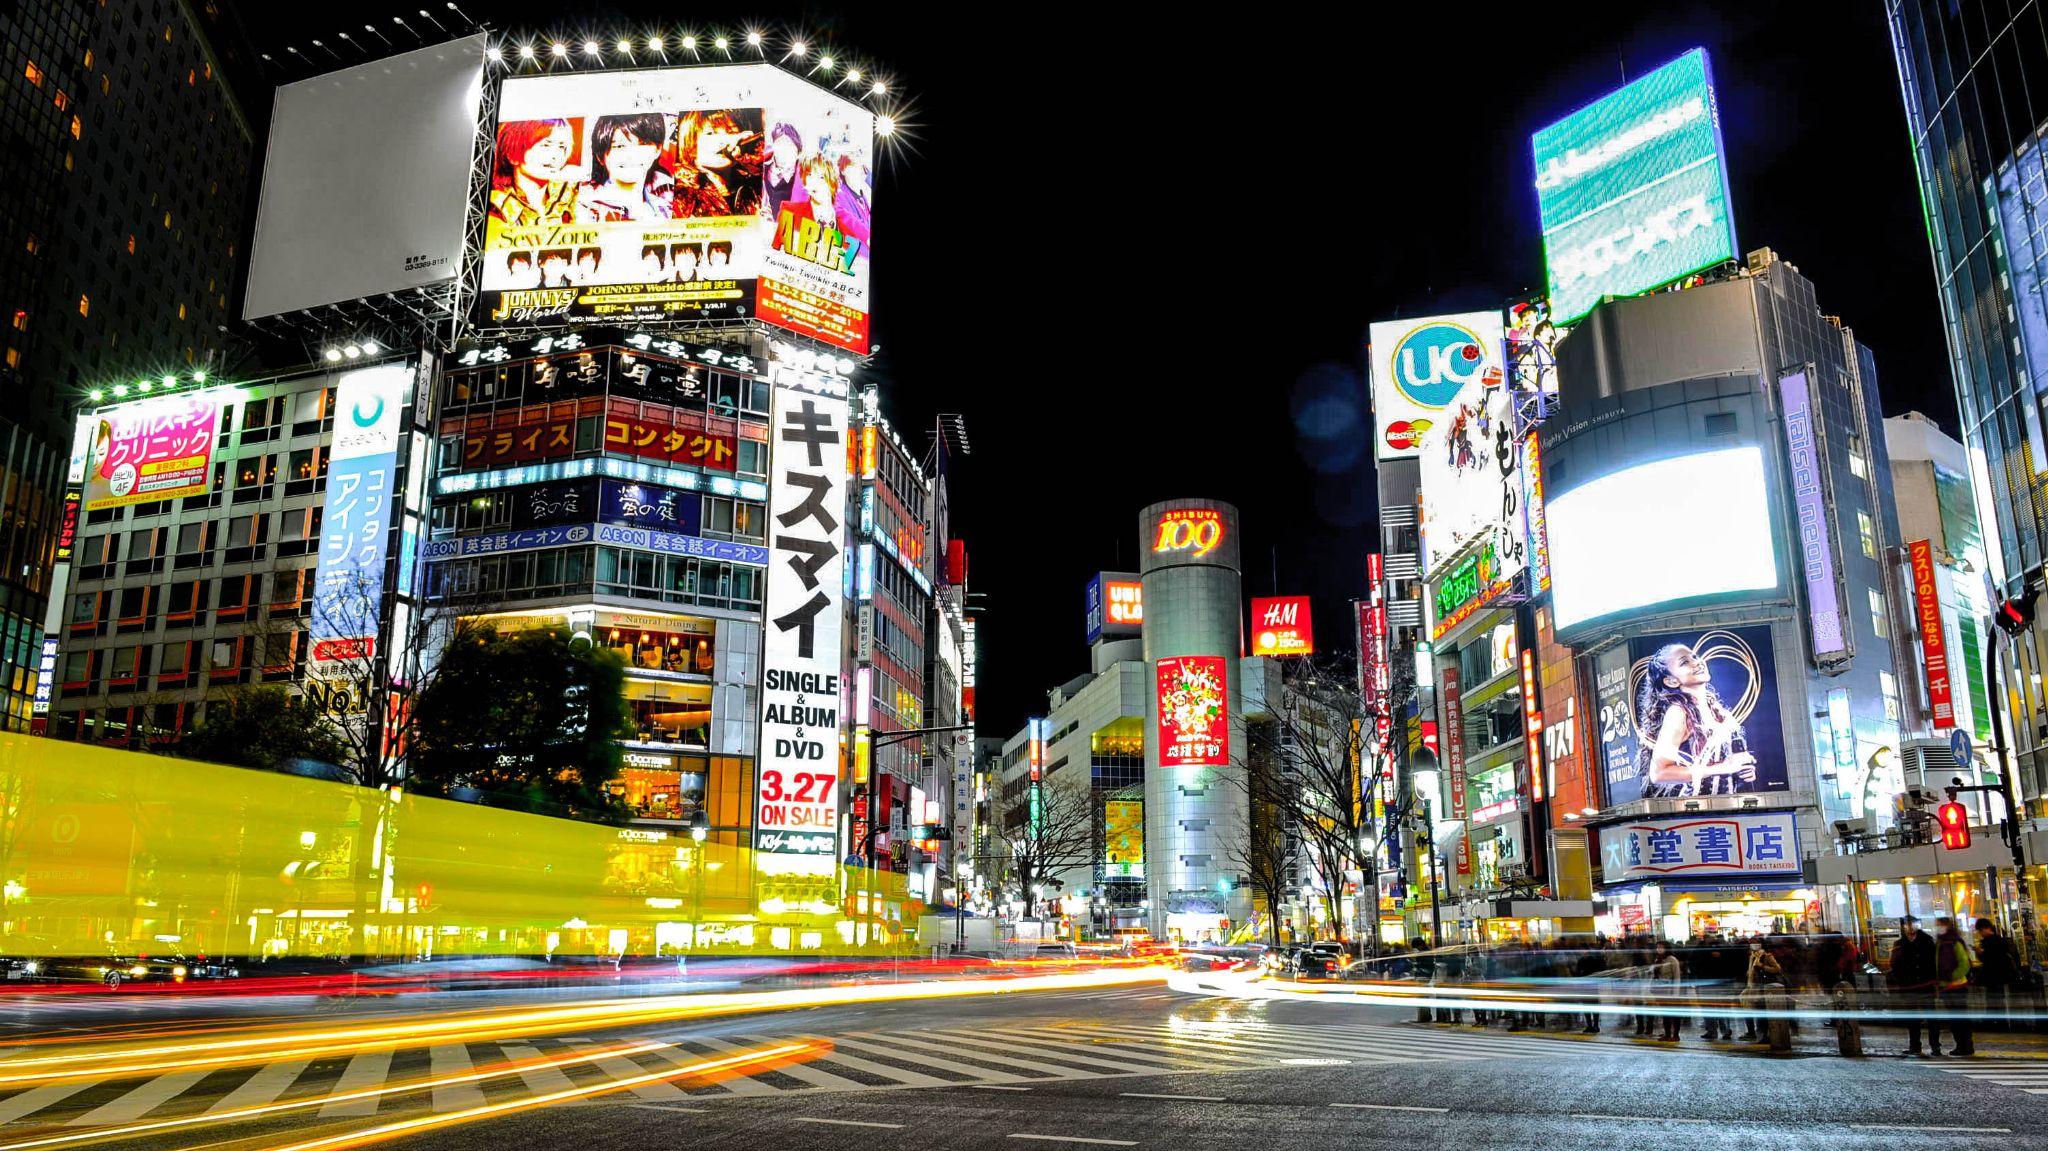 Shibuya crossing by Thomas Hubener